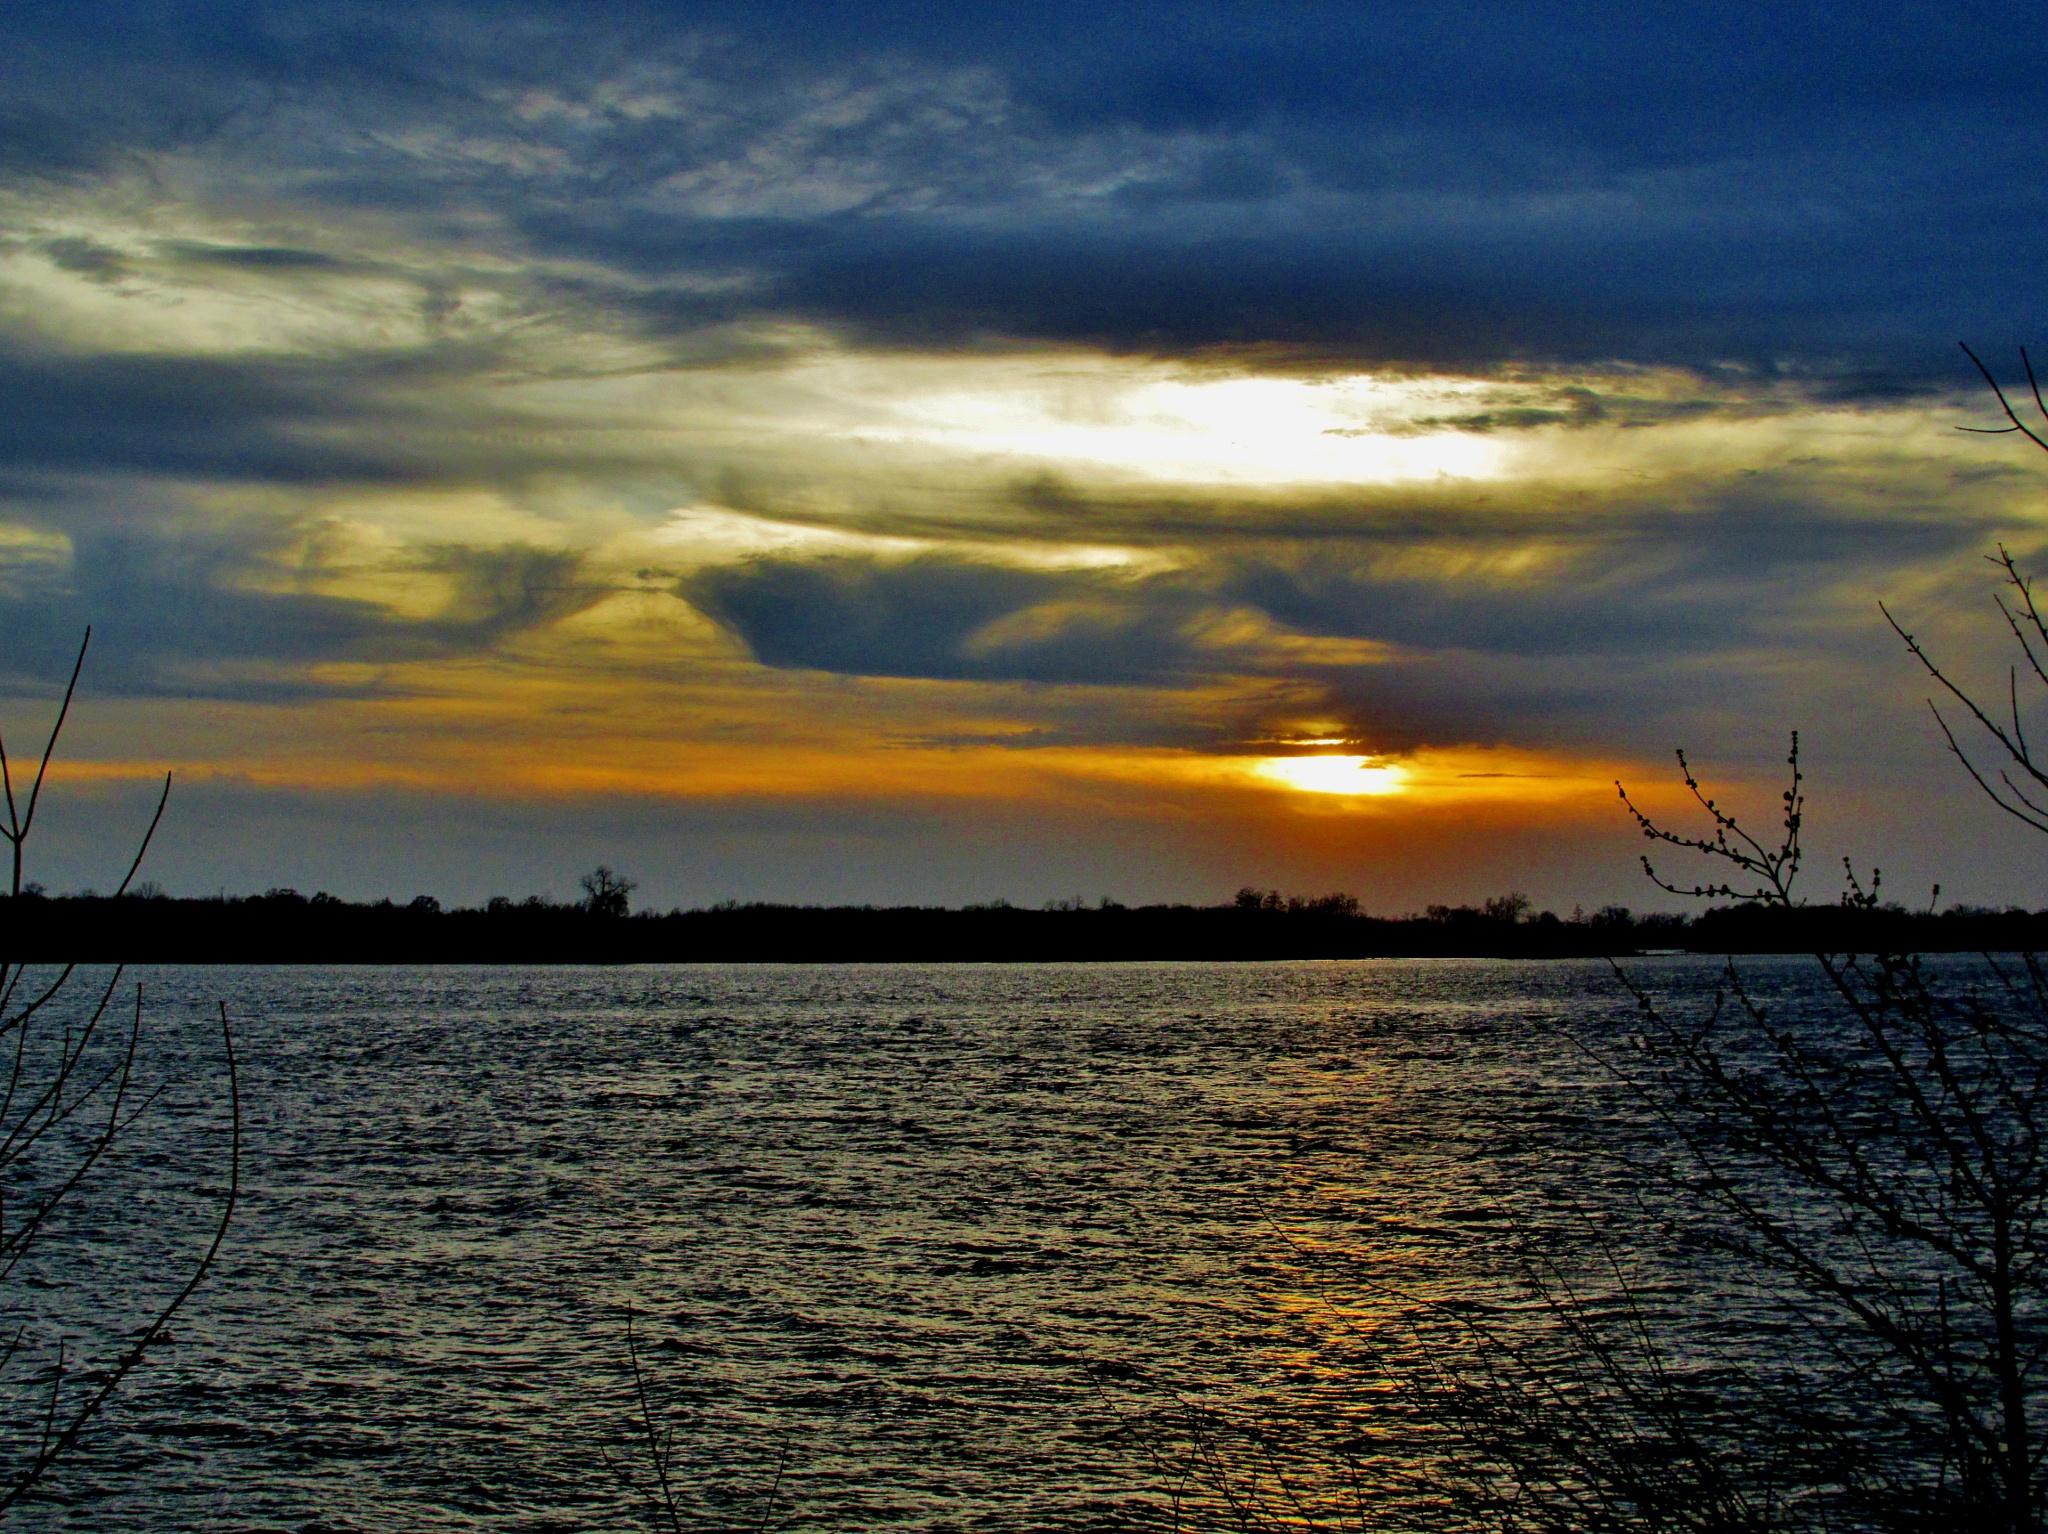 Sunset on the Illinois river by debbylesko